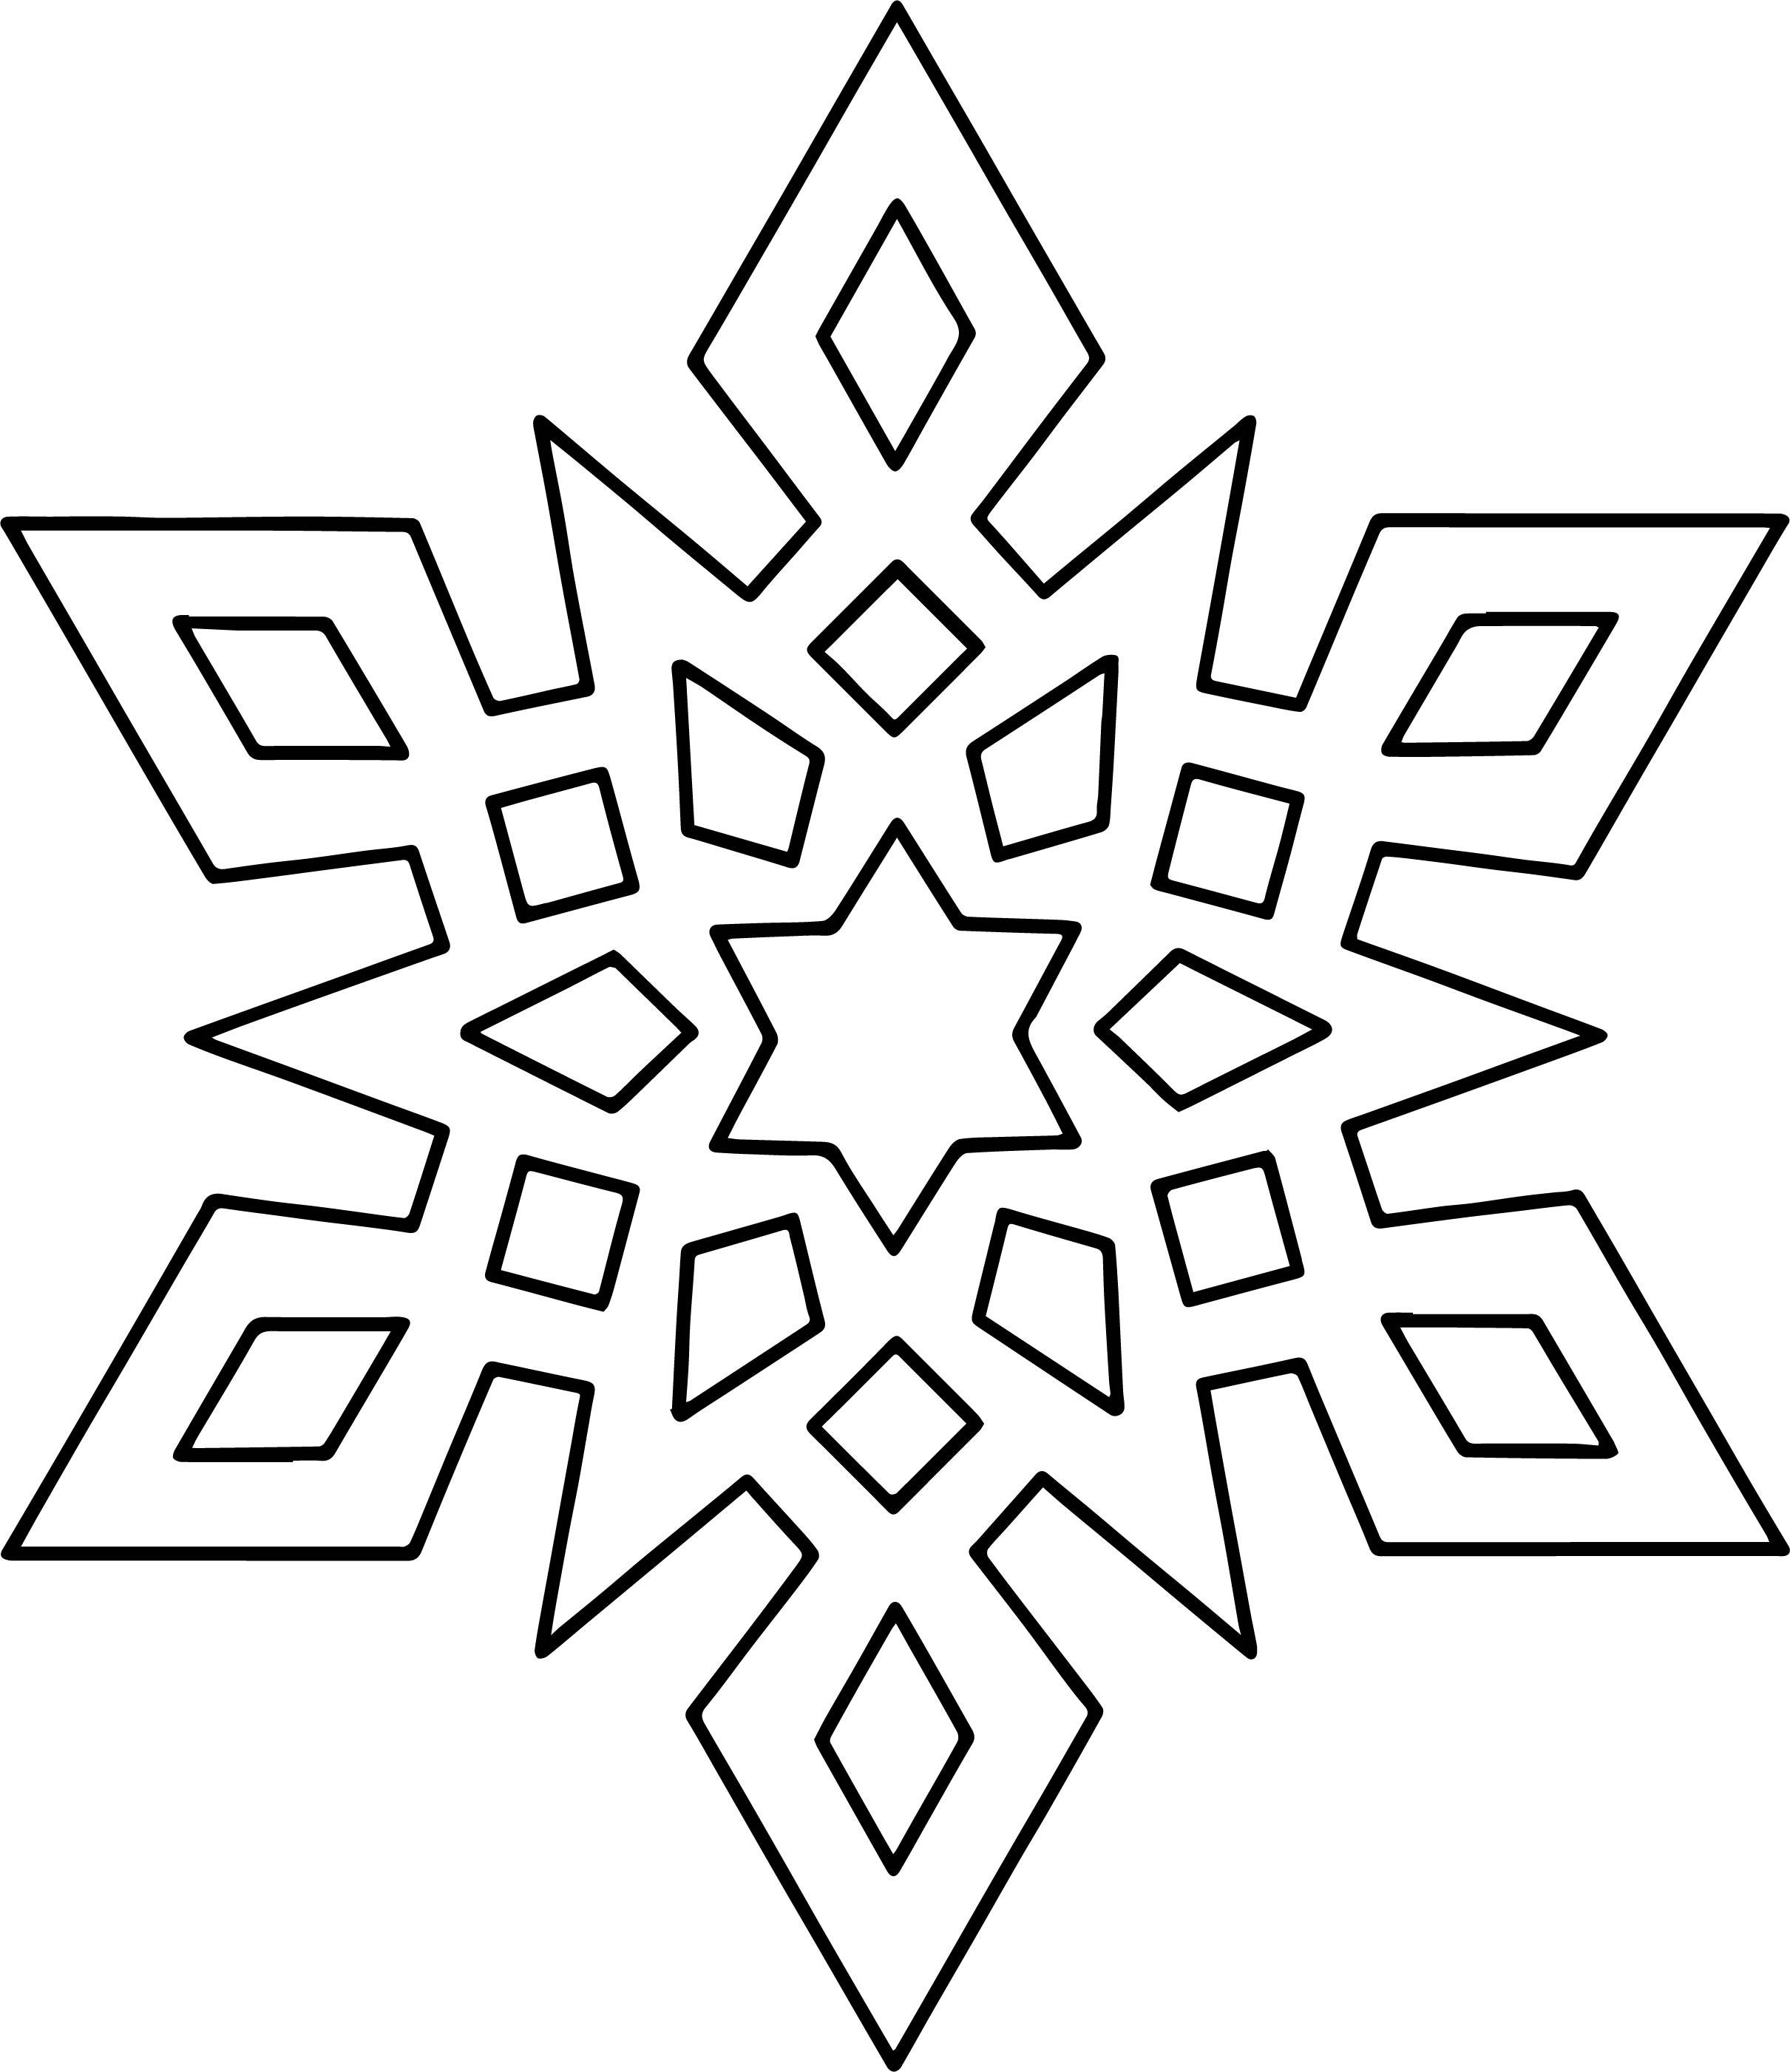 Crystal Snowflake Coloring Page Wecoloringpage